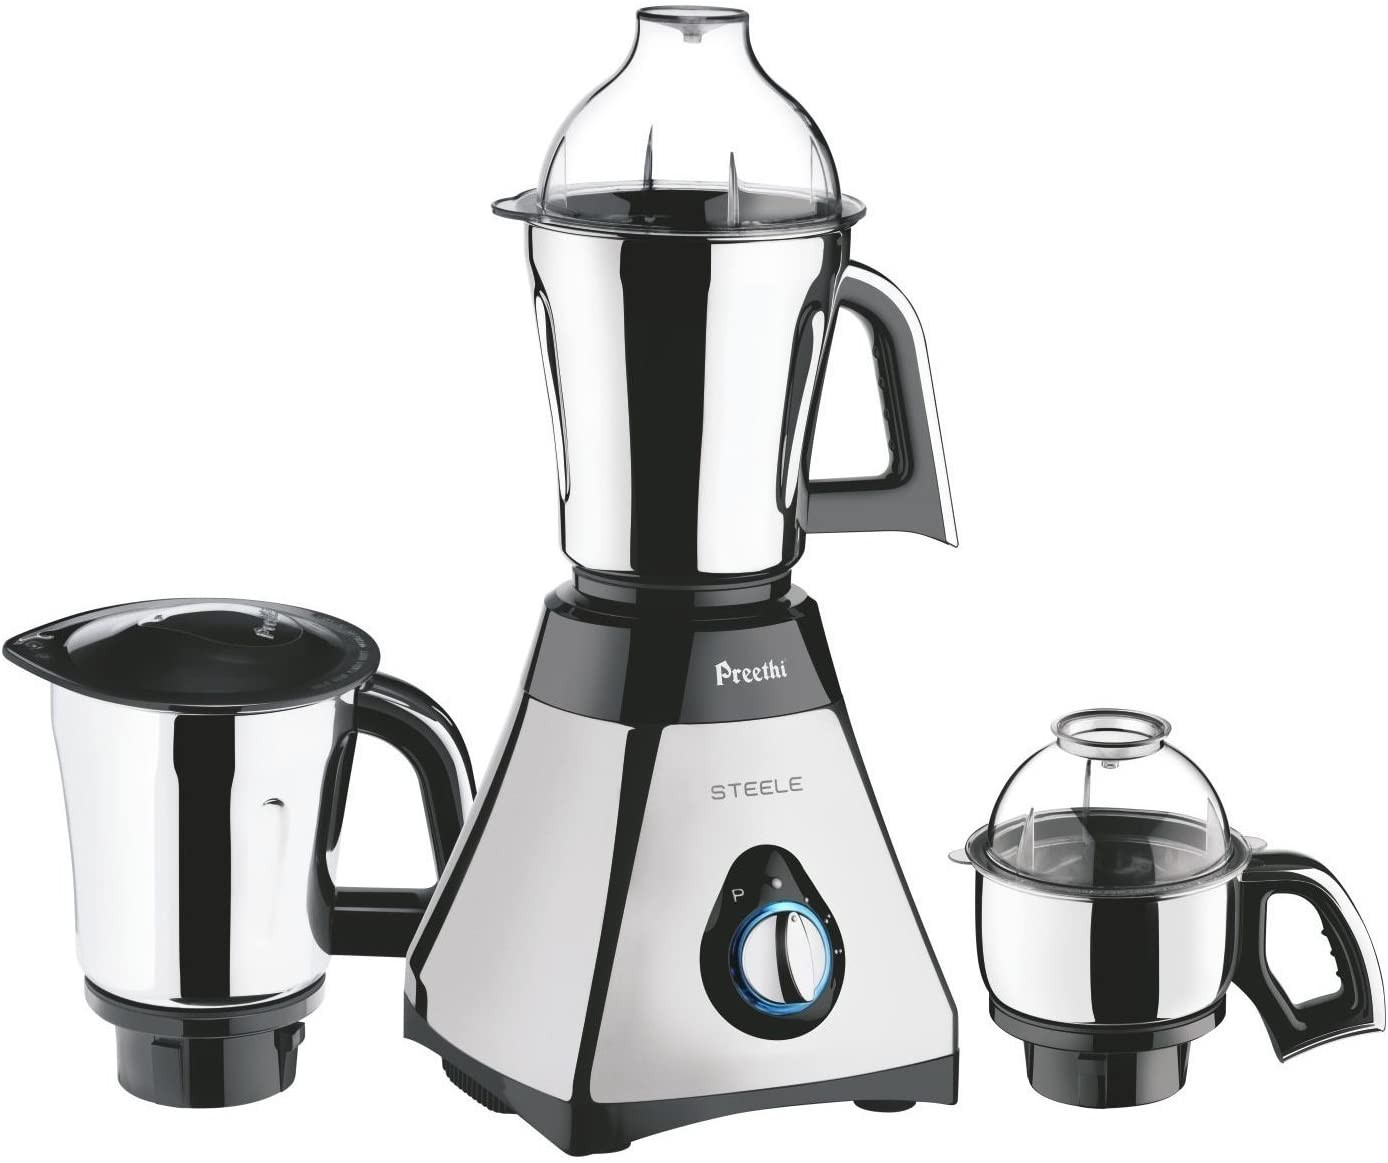 preethi-steele-supreme-550w-3-jar-mixer-grinder-110-volts